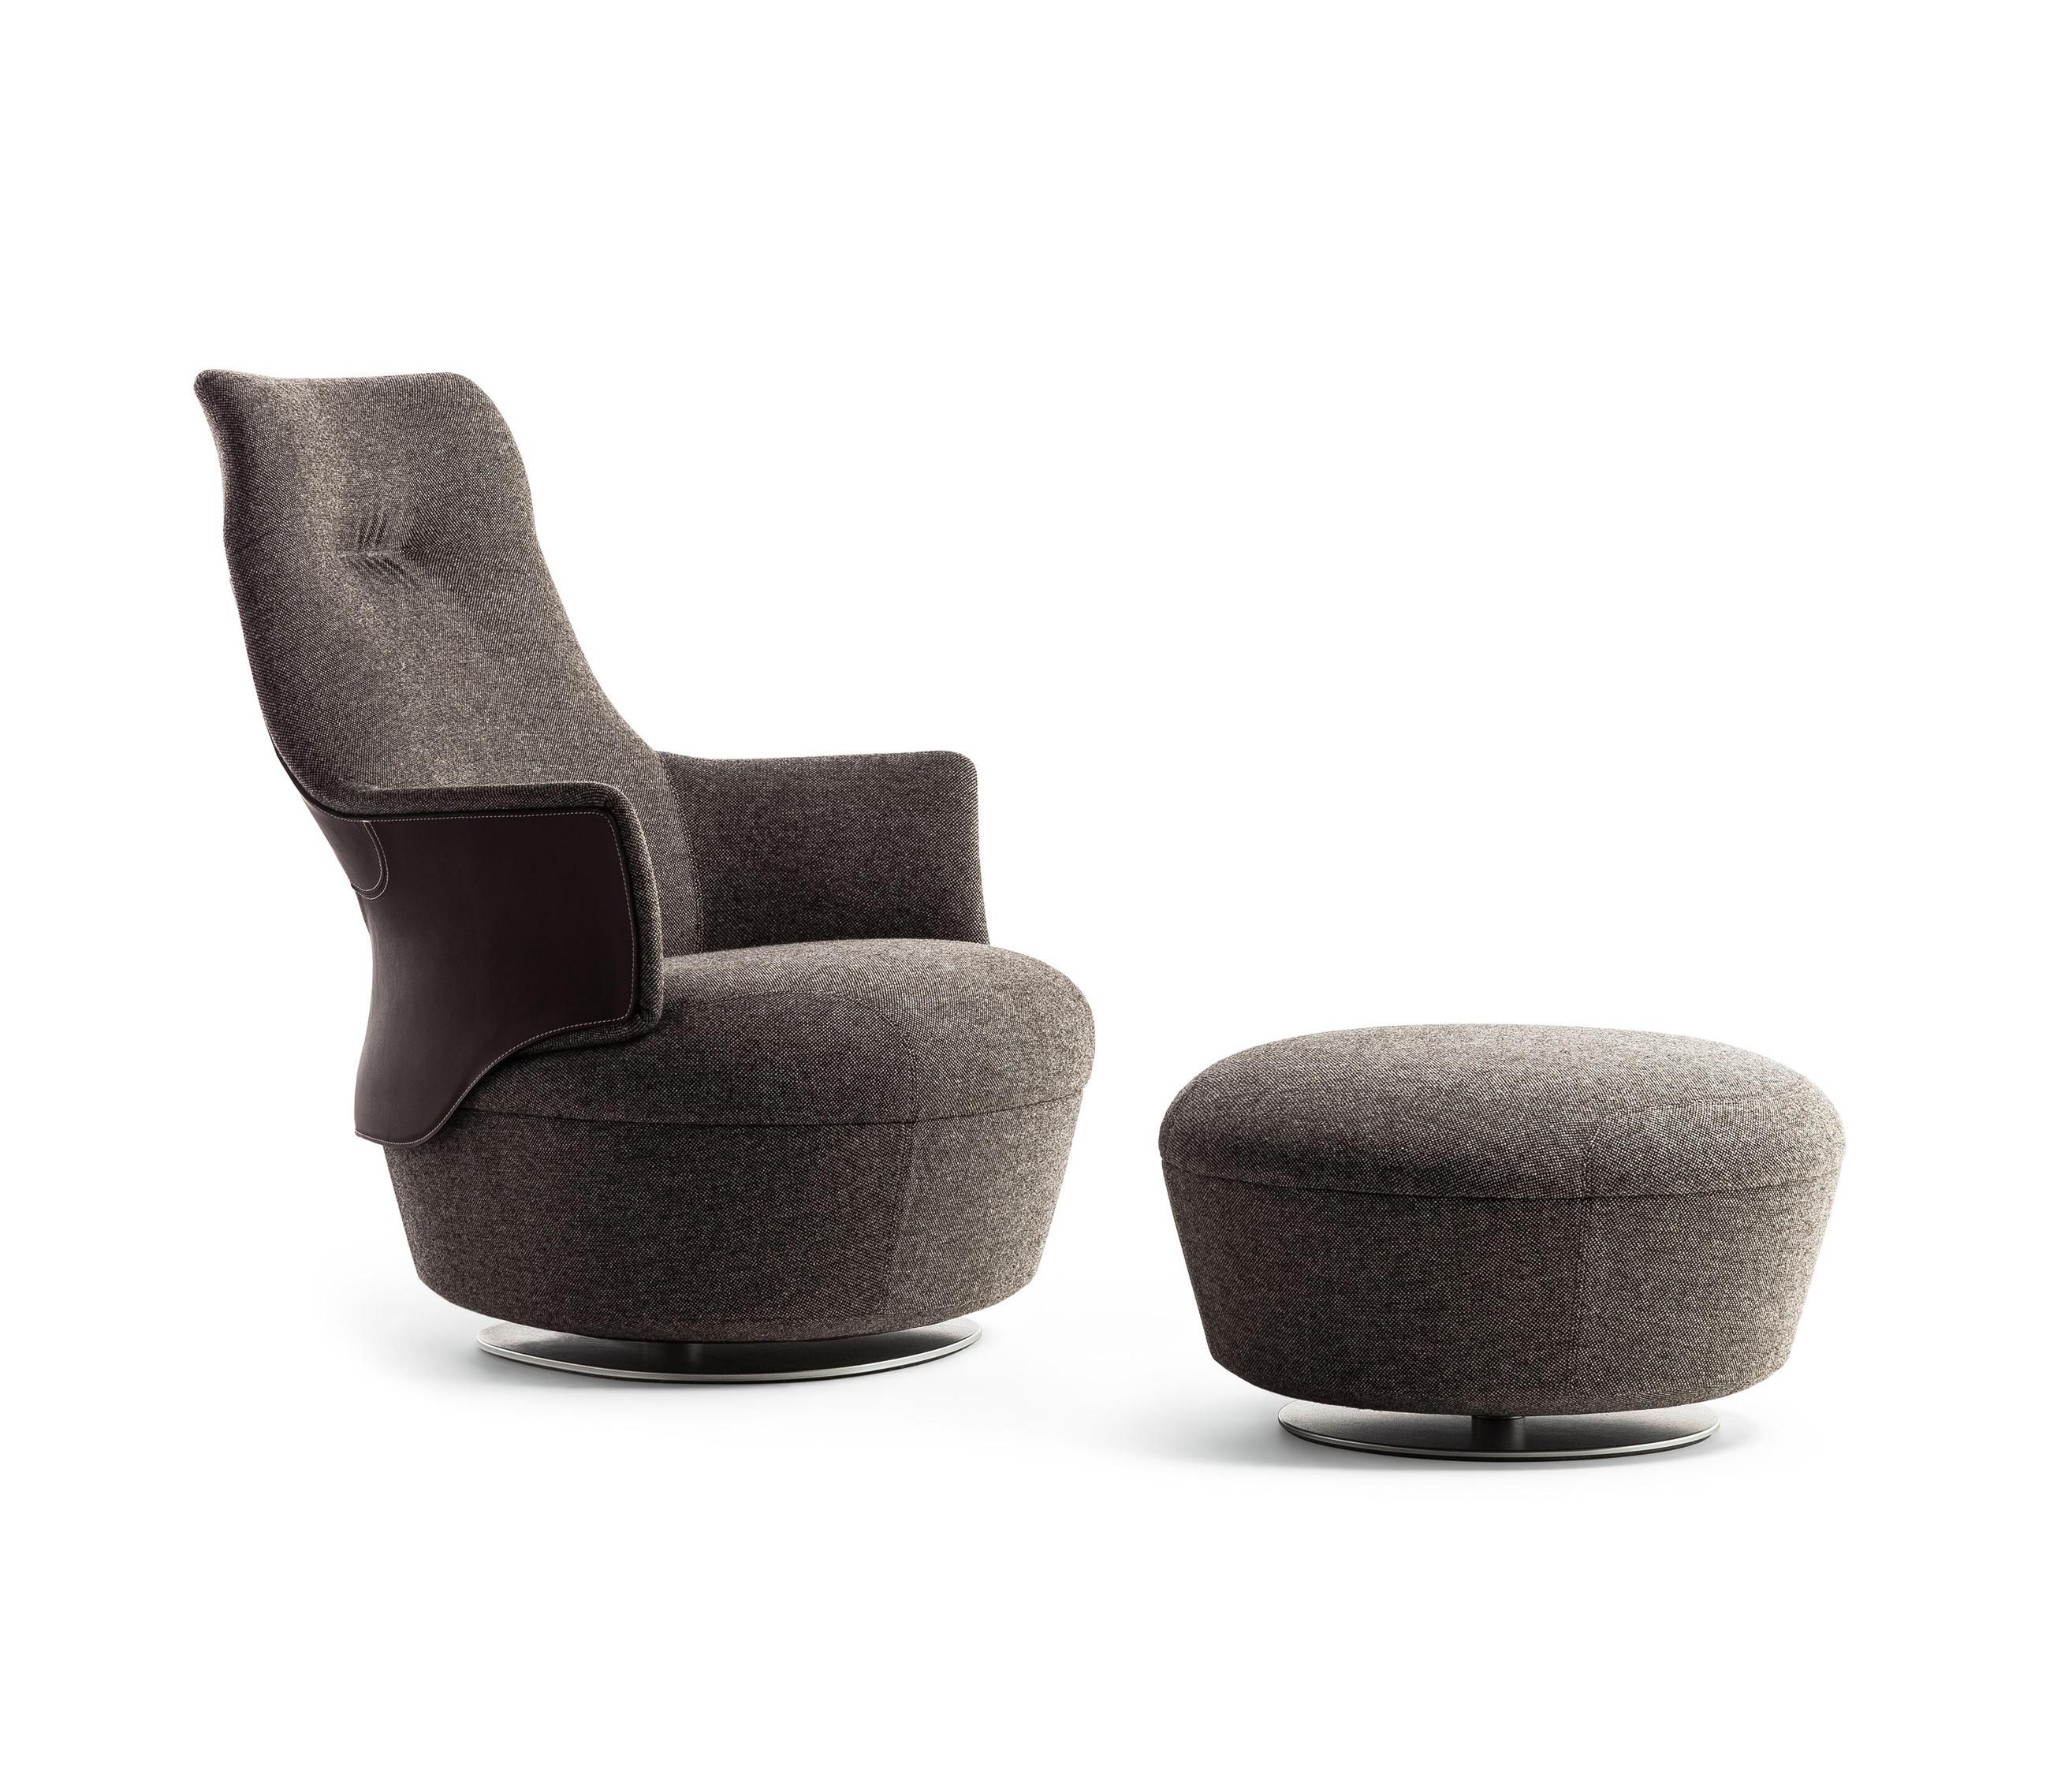 assaya fauteuils de poltrona frau architonic. Black Bedroom Furniture Sets. Home Design Ideas